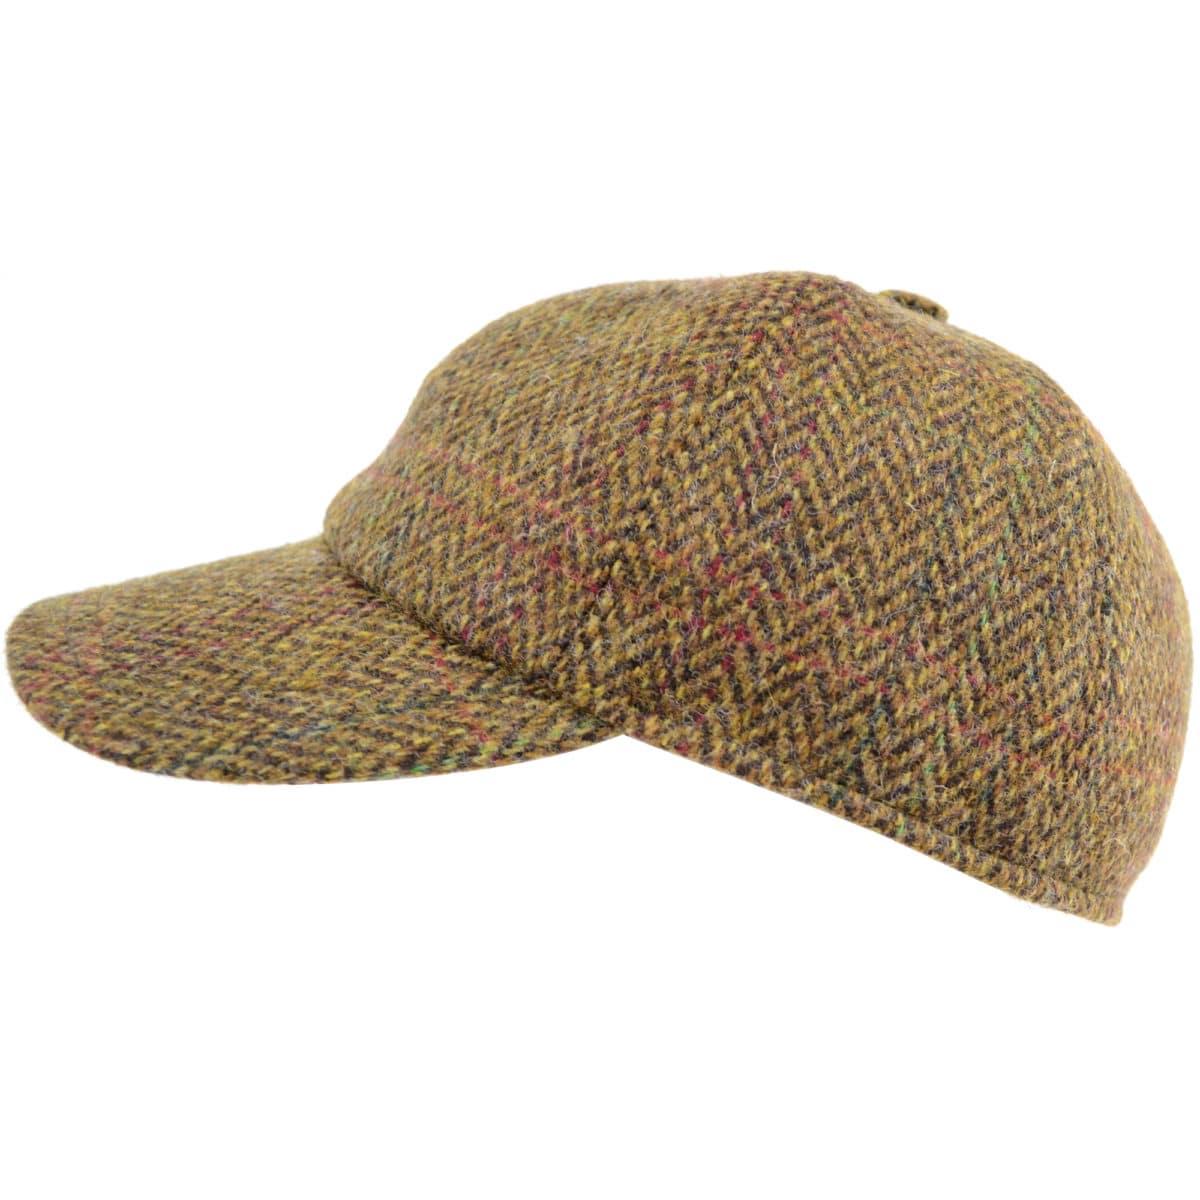 Tweed Baseball Cap - Light Brown - Flap Up